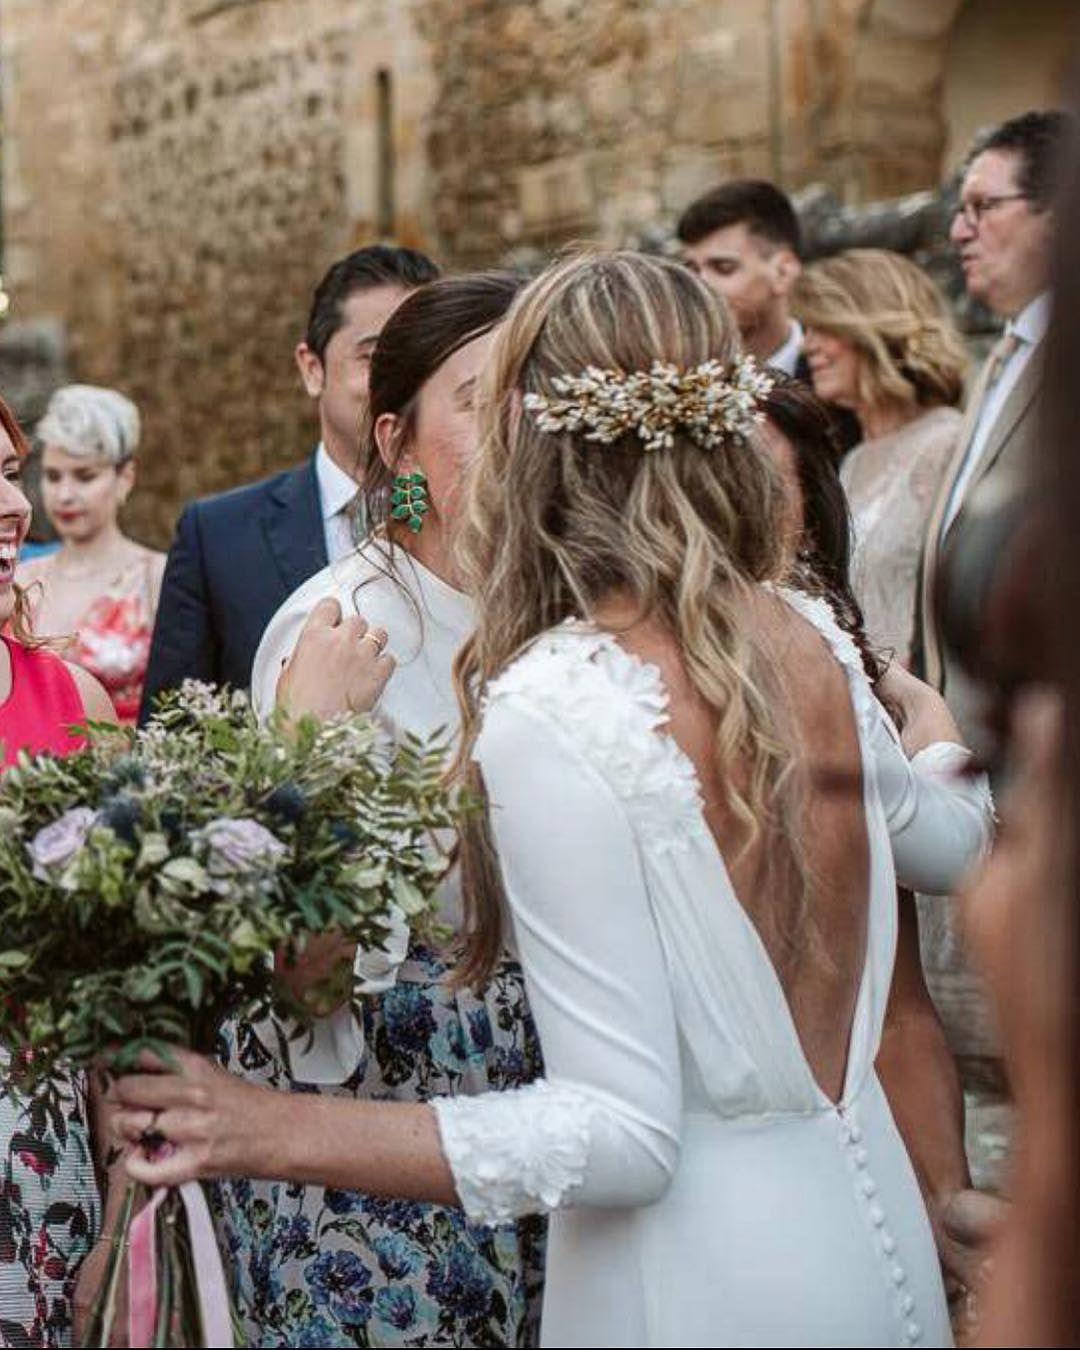 #bebas #dressbybebas #weddinginspiration #weddingdress